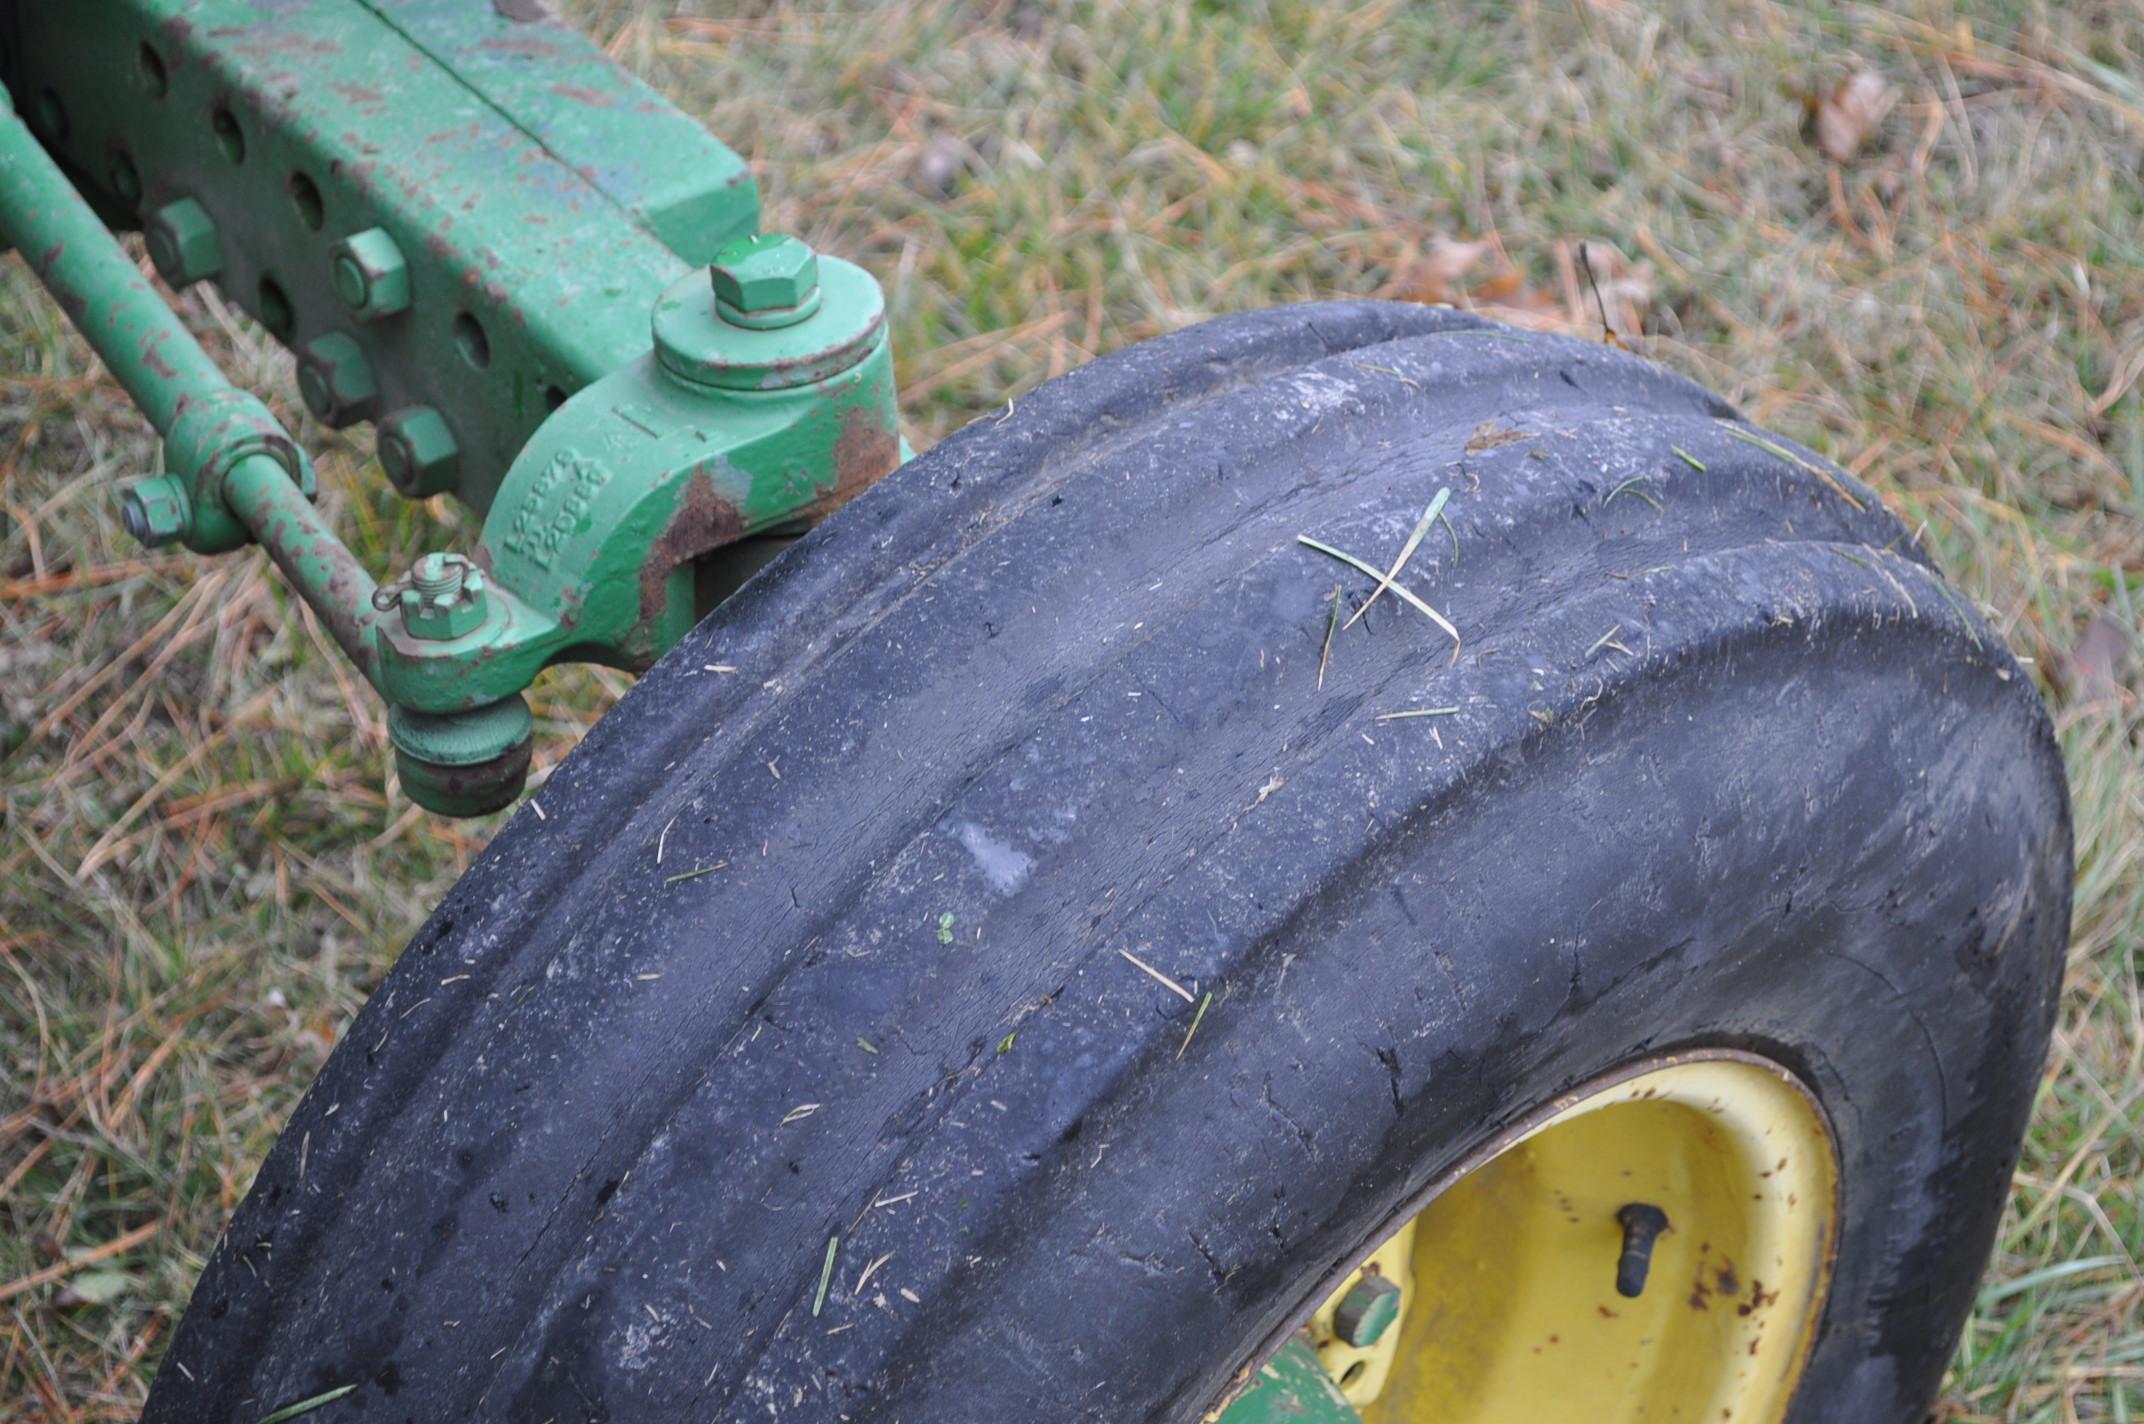 John Deere 2630 tractor, diesel, 16.9-28 rear, 9.5-15 front, 1 hyd remote, 540 pto, 3 pt, 4260 - Image 8 of 18